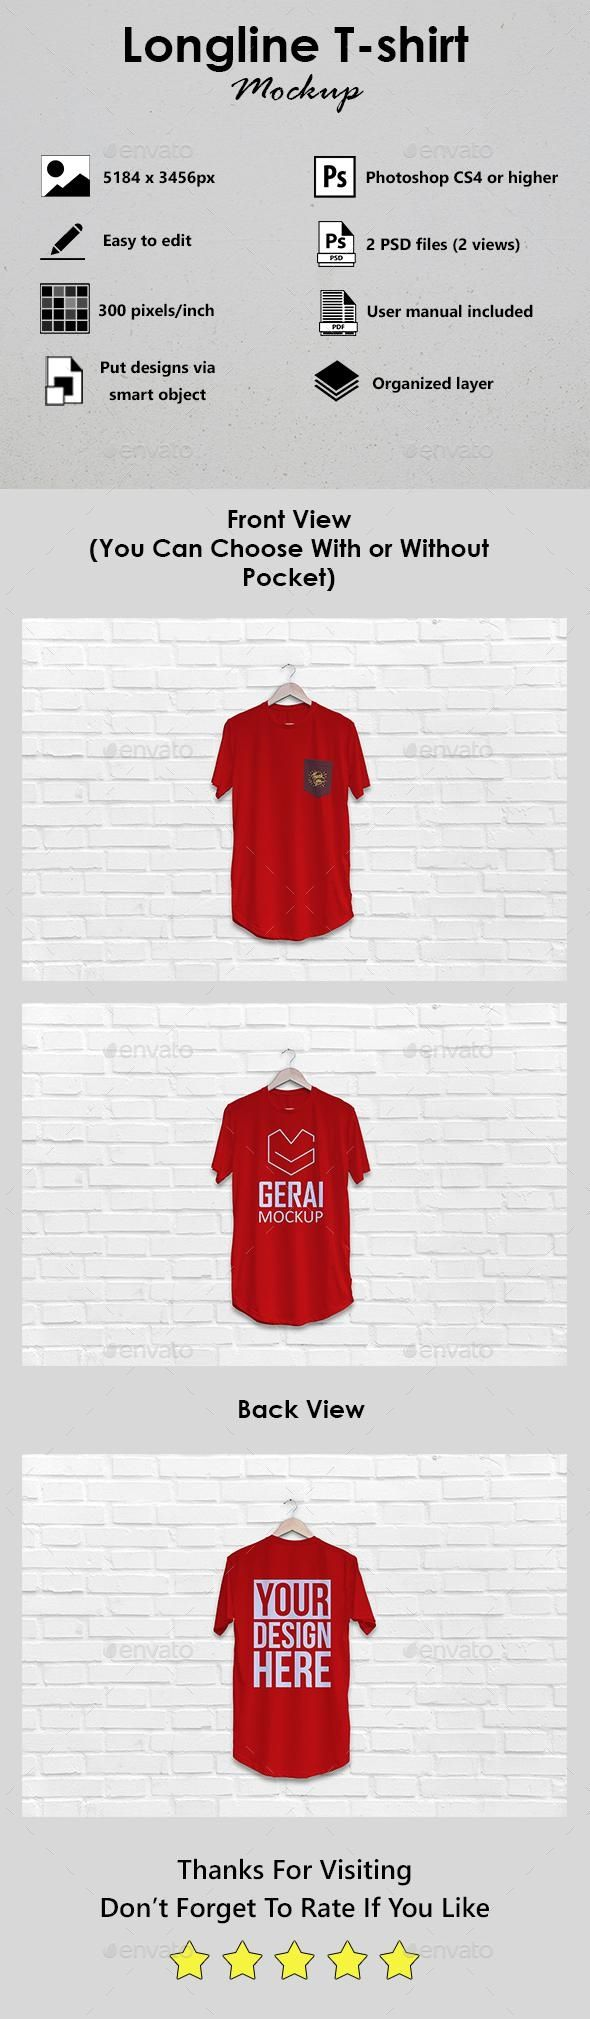 Download Longline T Shirt Mockup Mockup Psd Template Graphicriver Bestdesignresources Tshirt Mockup Clothing Mockup Shirt Mockup